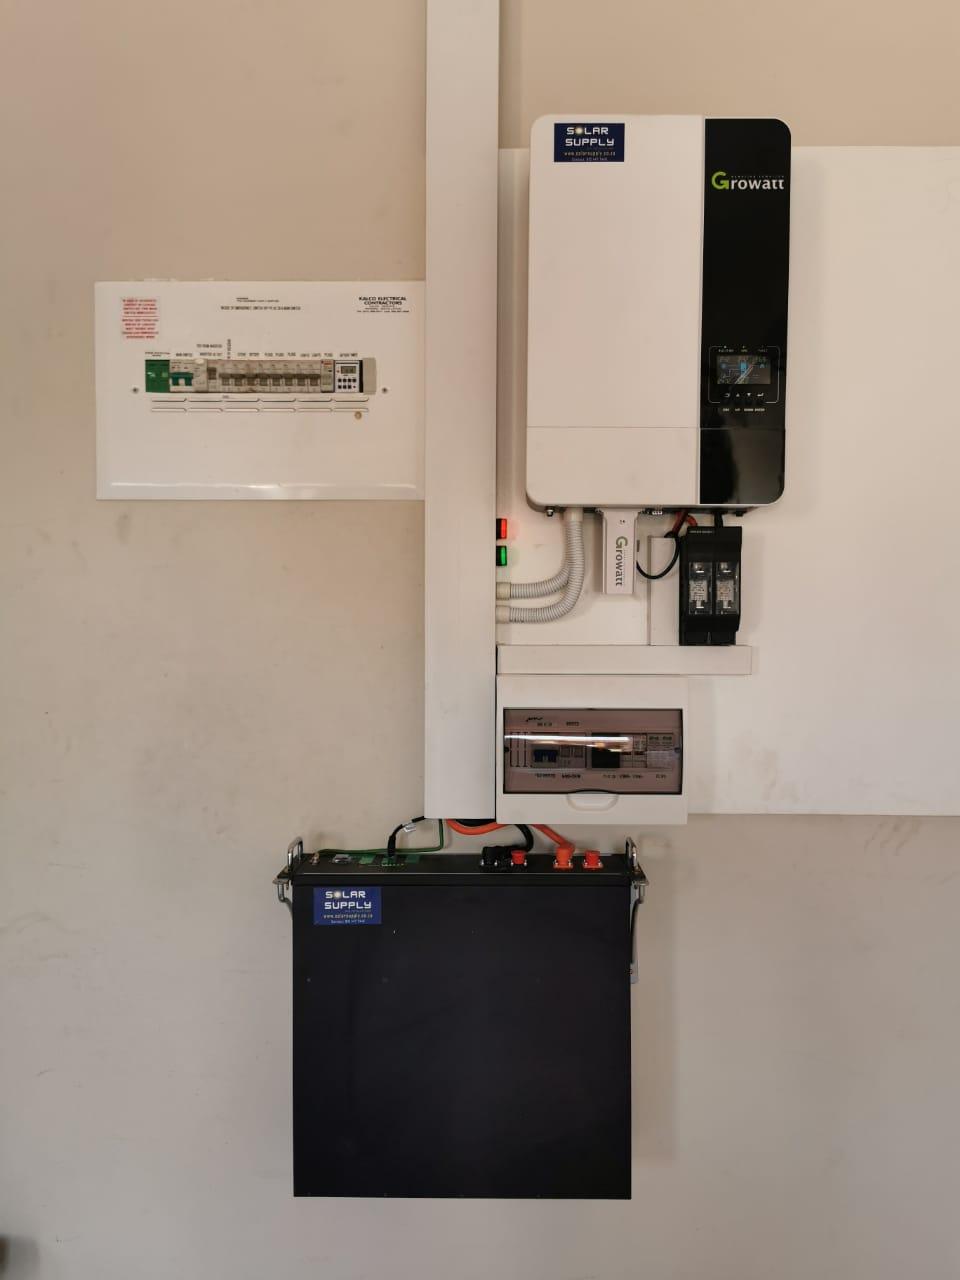 Solar Supply Battery Spec 1 x Pylontech 3.5 kWh Lithium-Ion Batteries